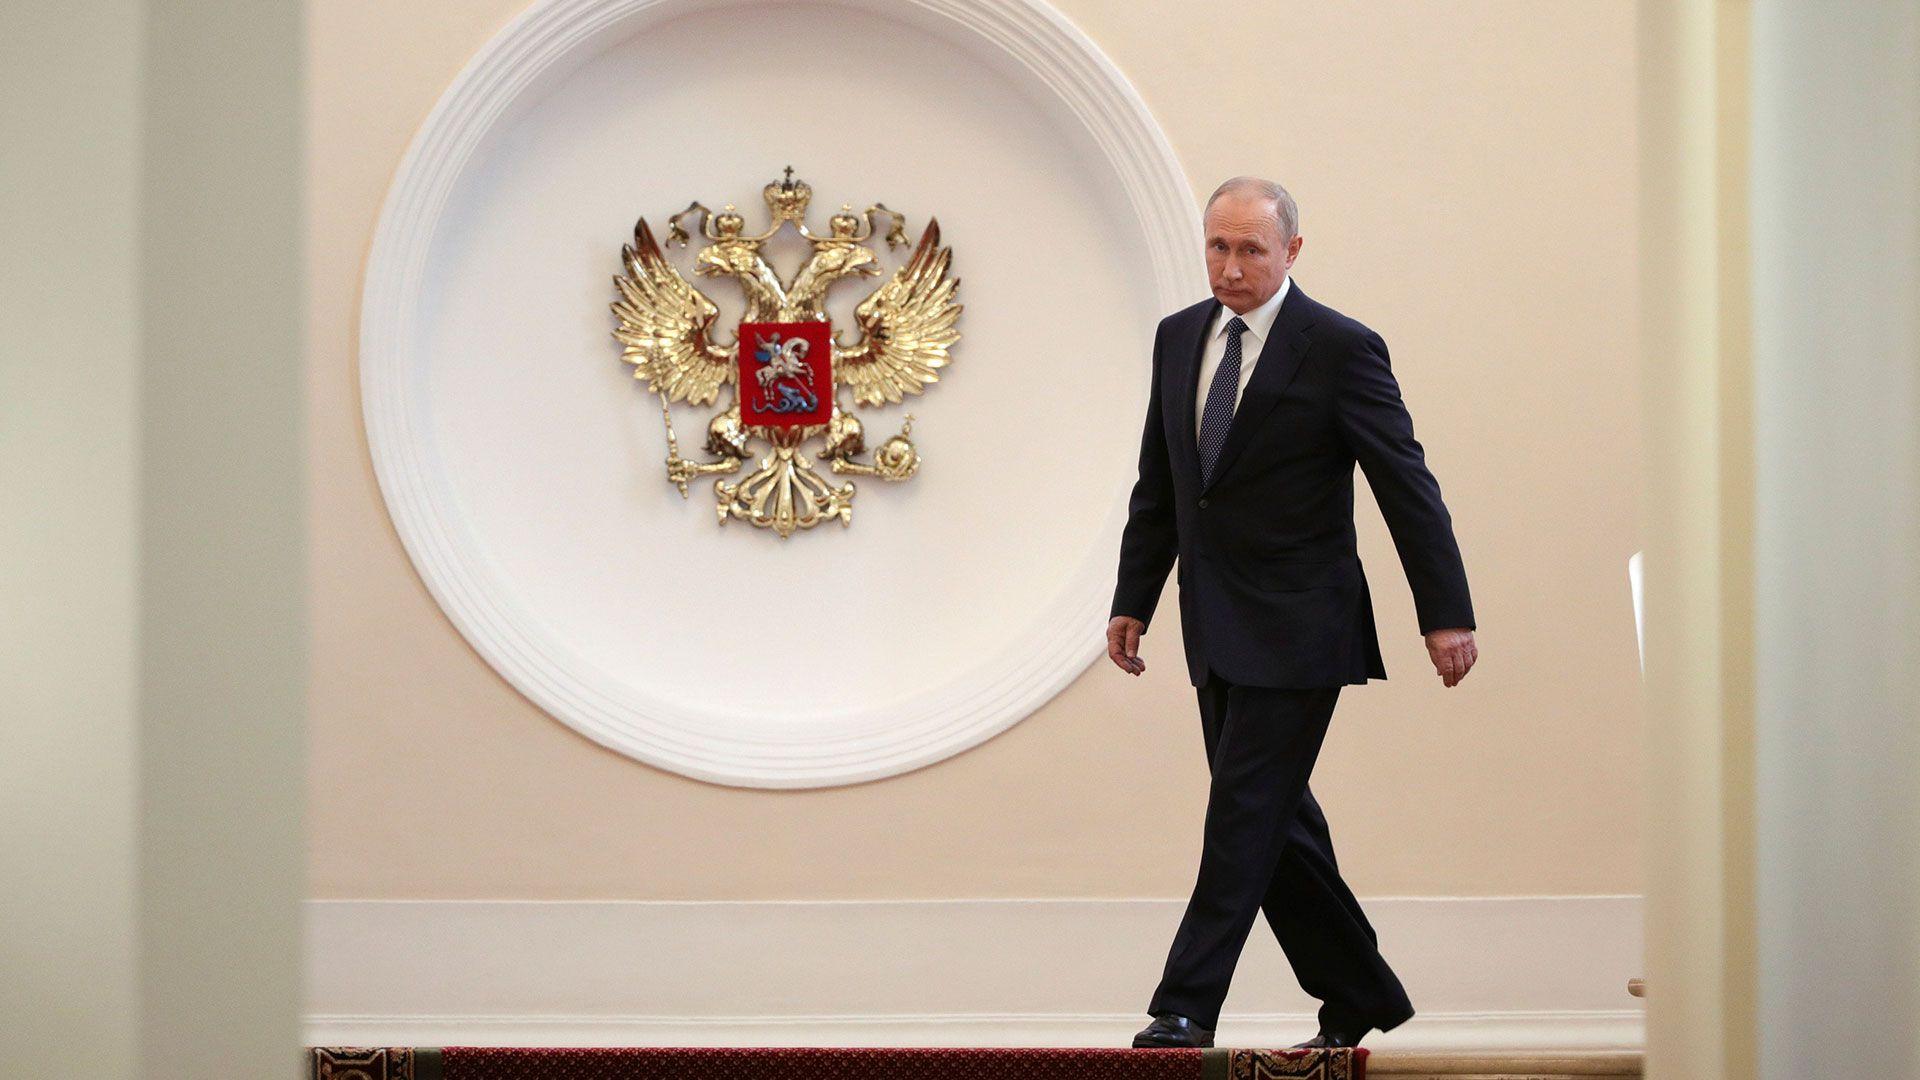 Vladimir Putin en el Kremlin, centro del poder en Rusia. (Reuters)